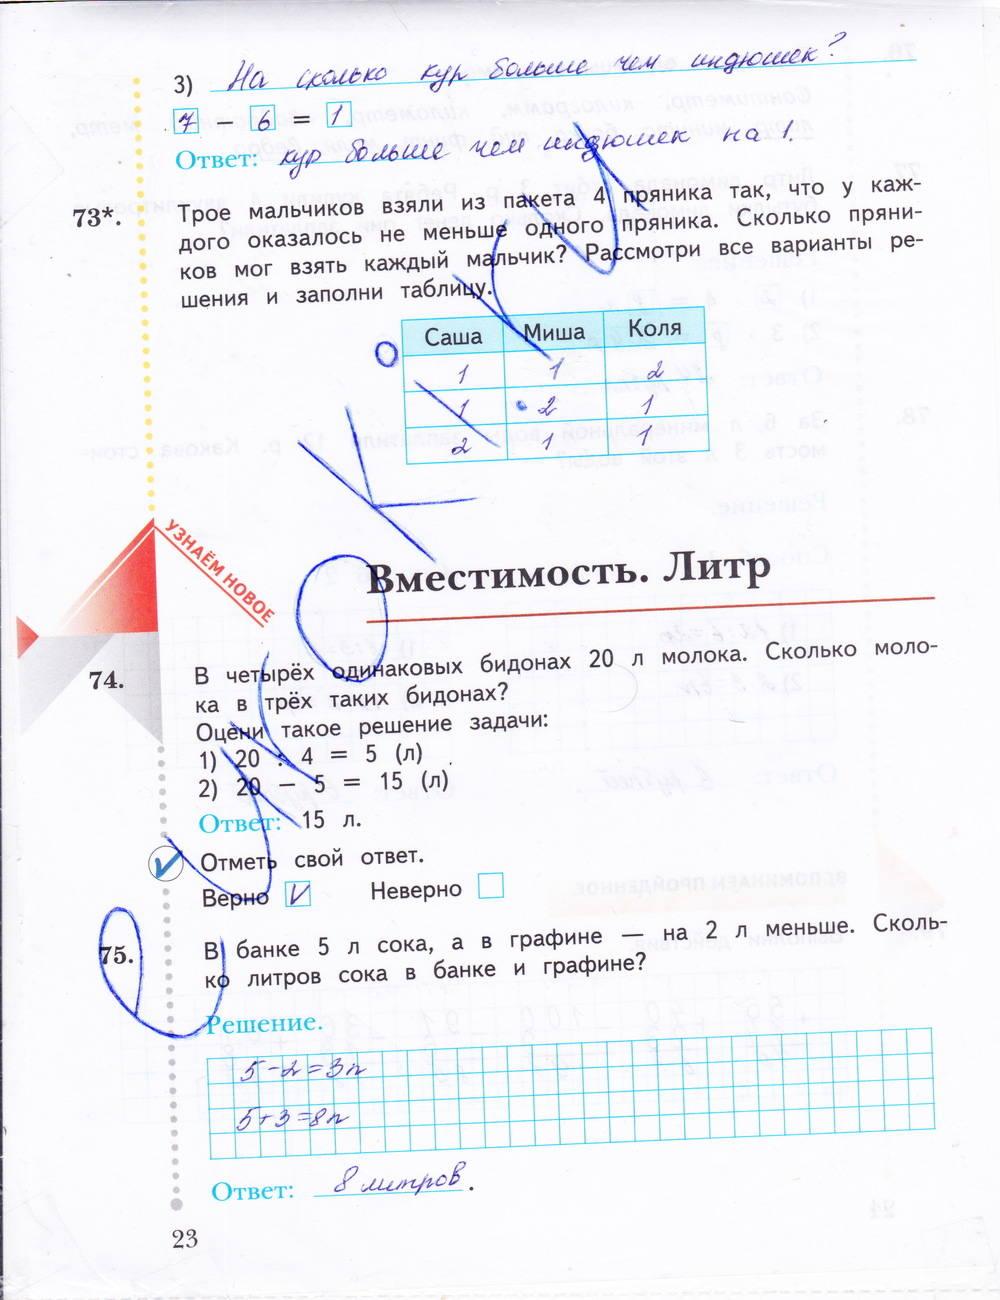 Рудницкая тетрадь рабочая юдачева математика 3 1 класса гдз